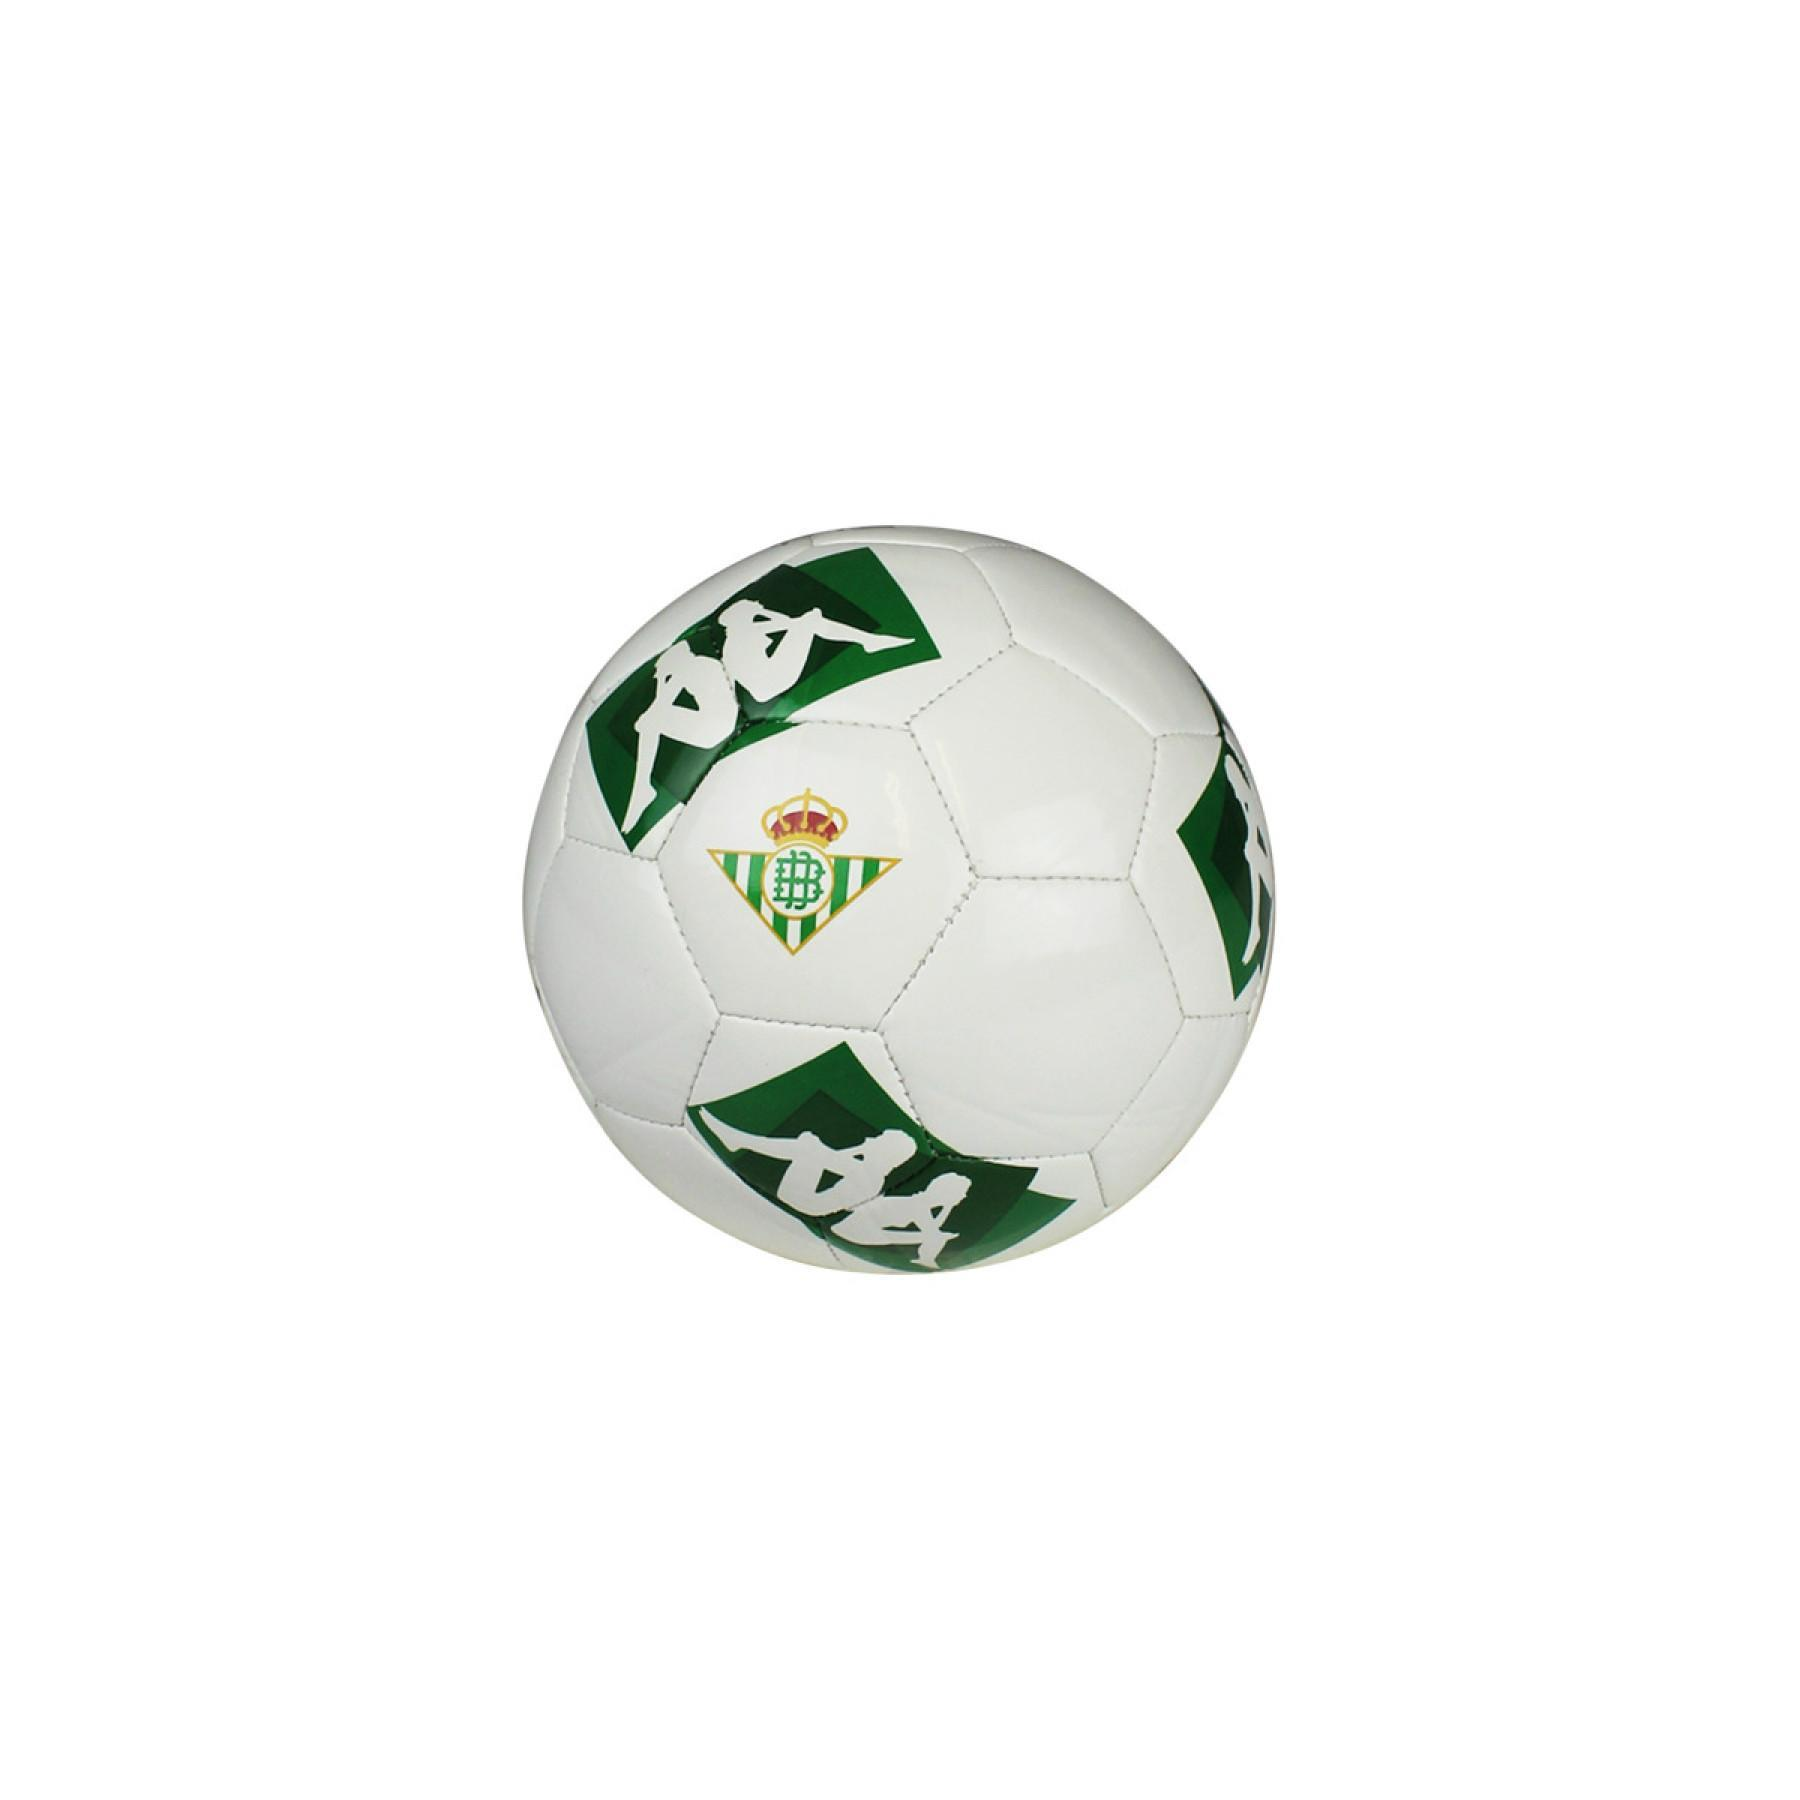 Ball Betis Seville 2020/21 player miniball real